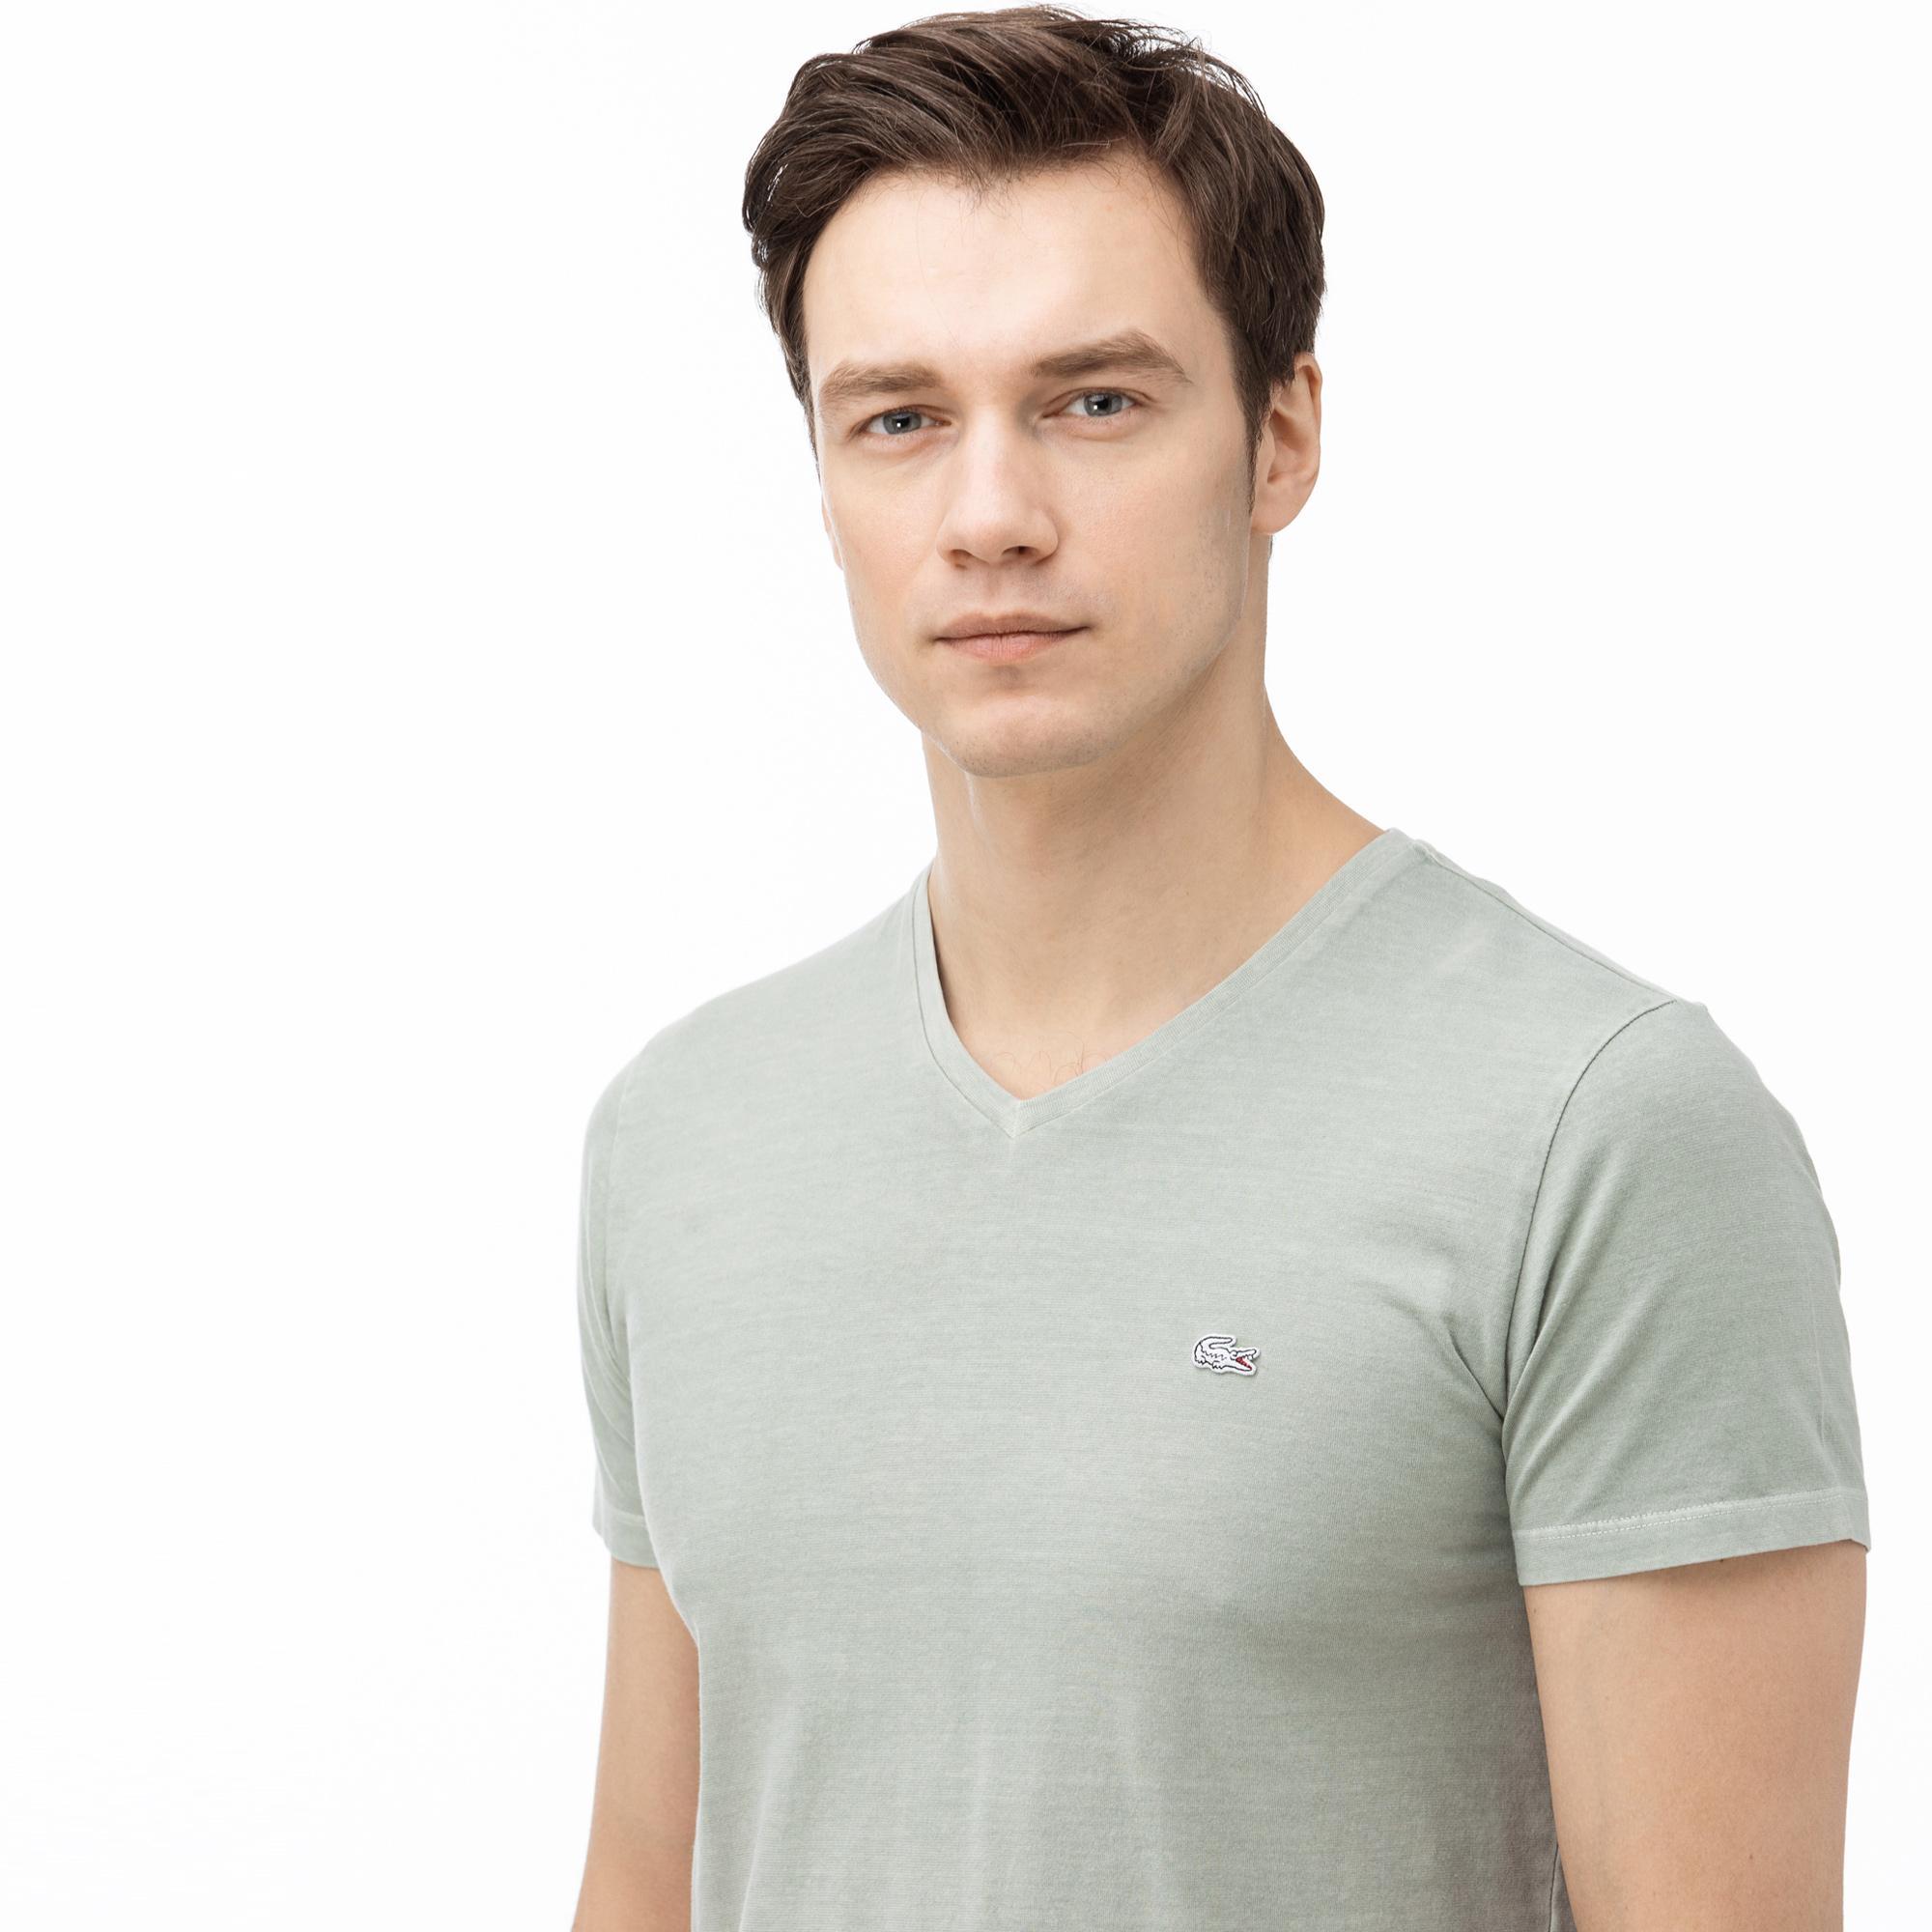 Lacoste Erkek V Yaka Açık Yeşil T-Shirt